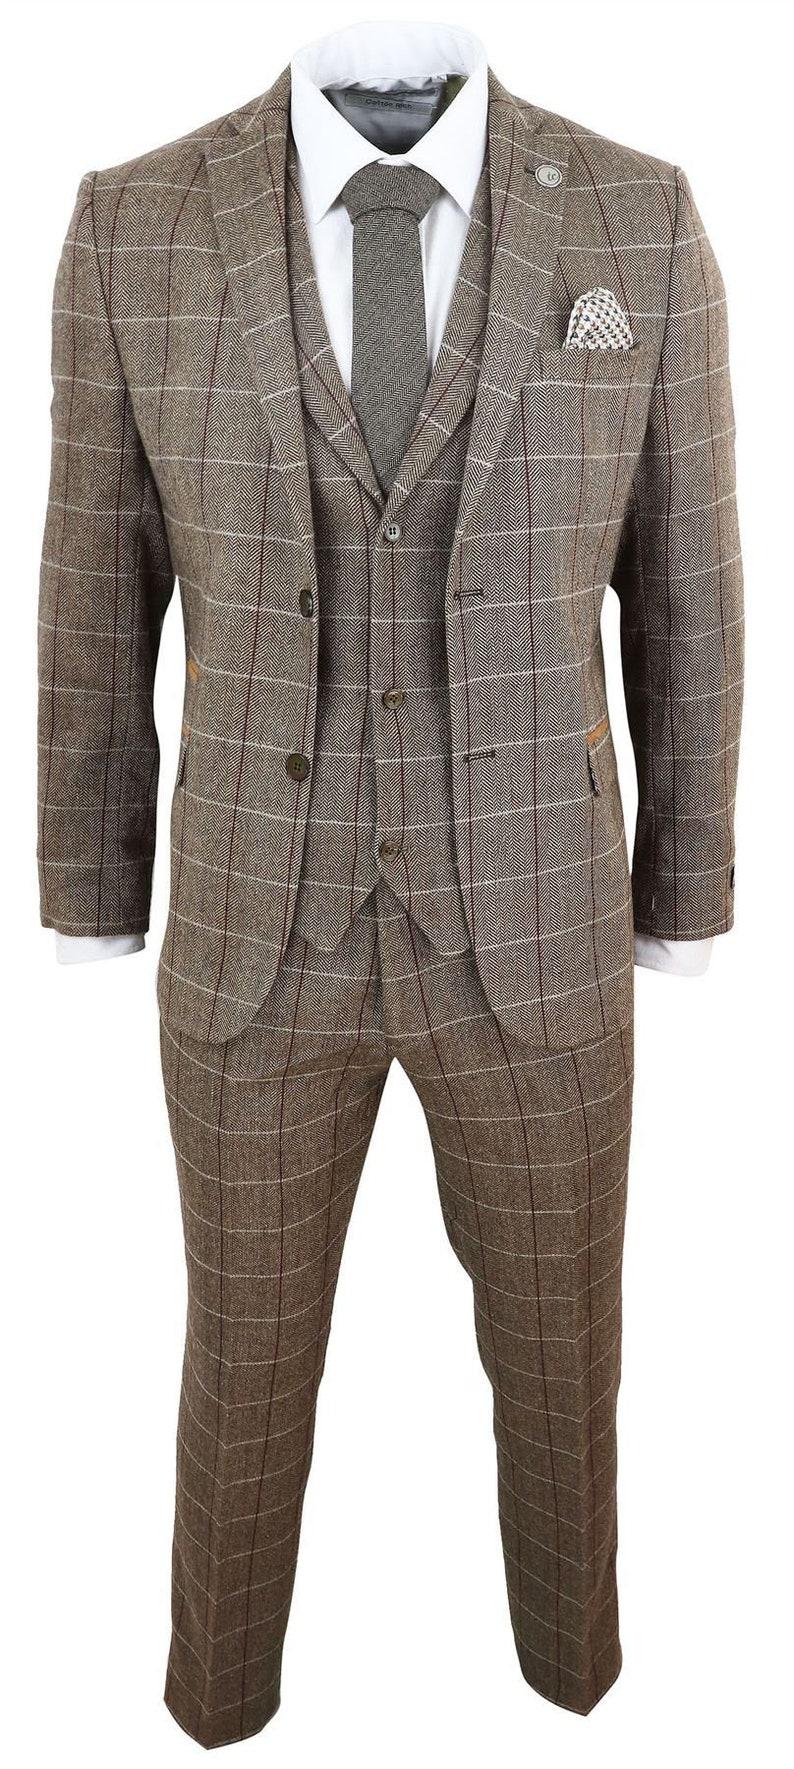 Men's Vintage Clothing | Retro Clothing for Men     Mens 3 piece tweed suit check wool oak brown  1920s retro classic $180.33 AT vintagedancer.com